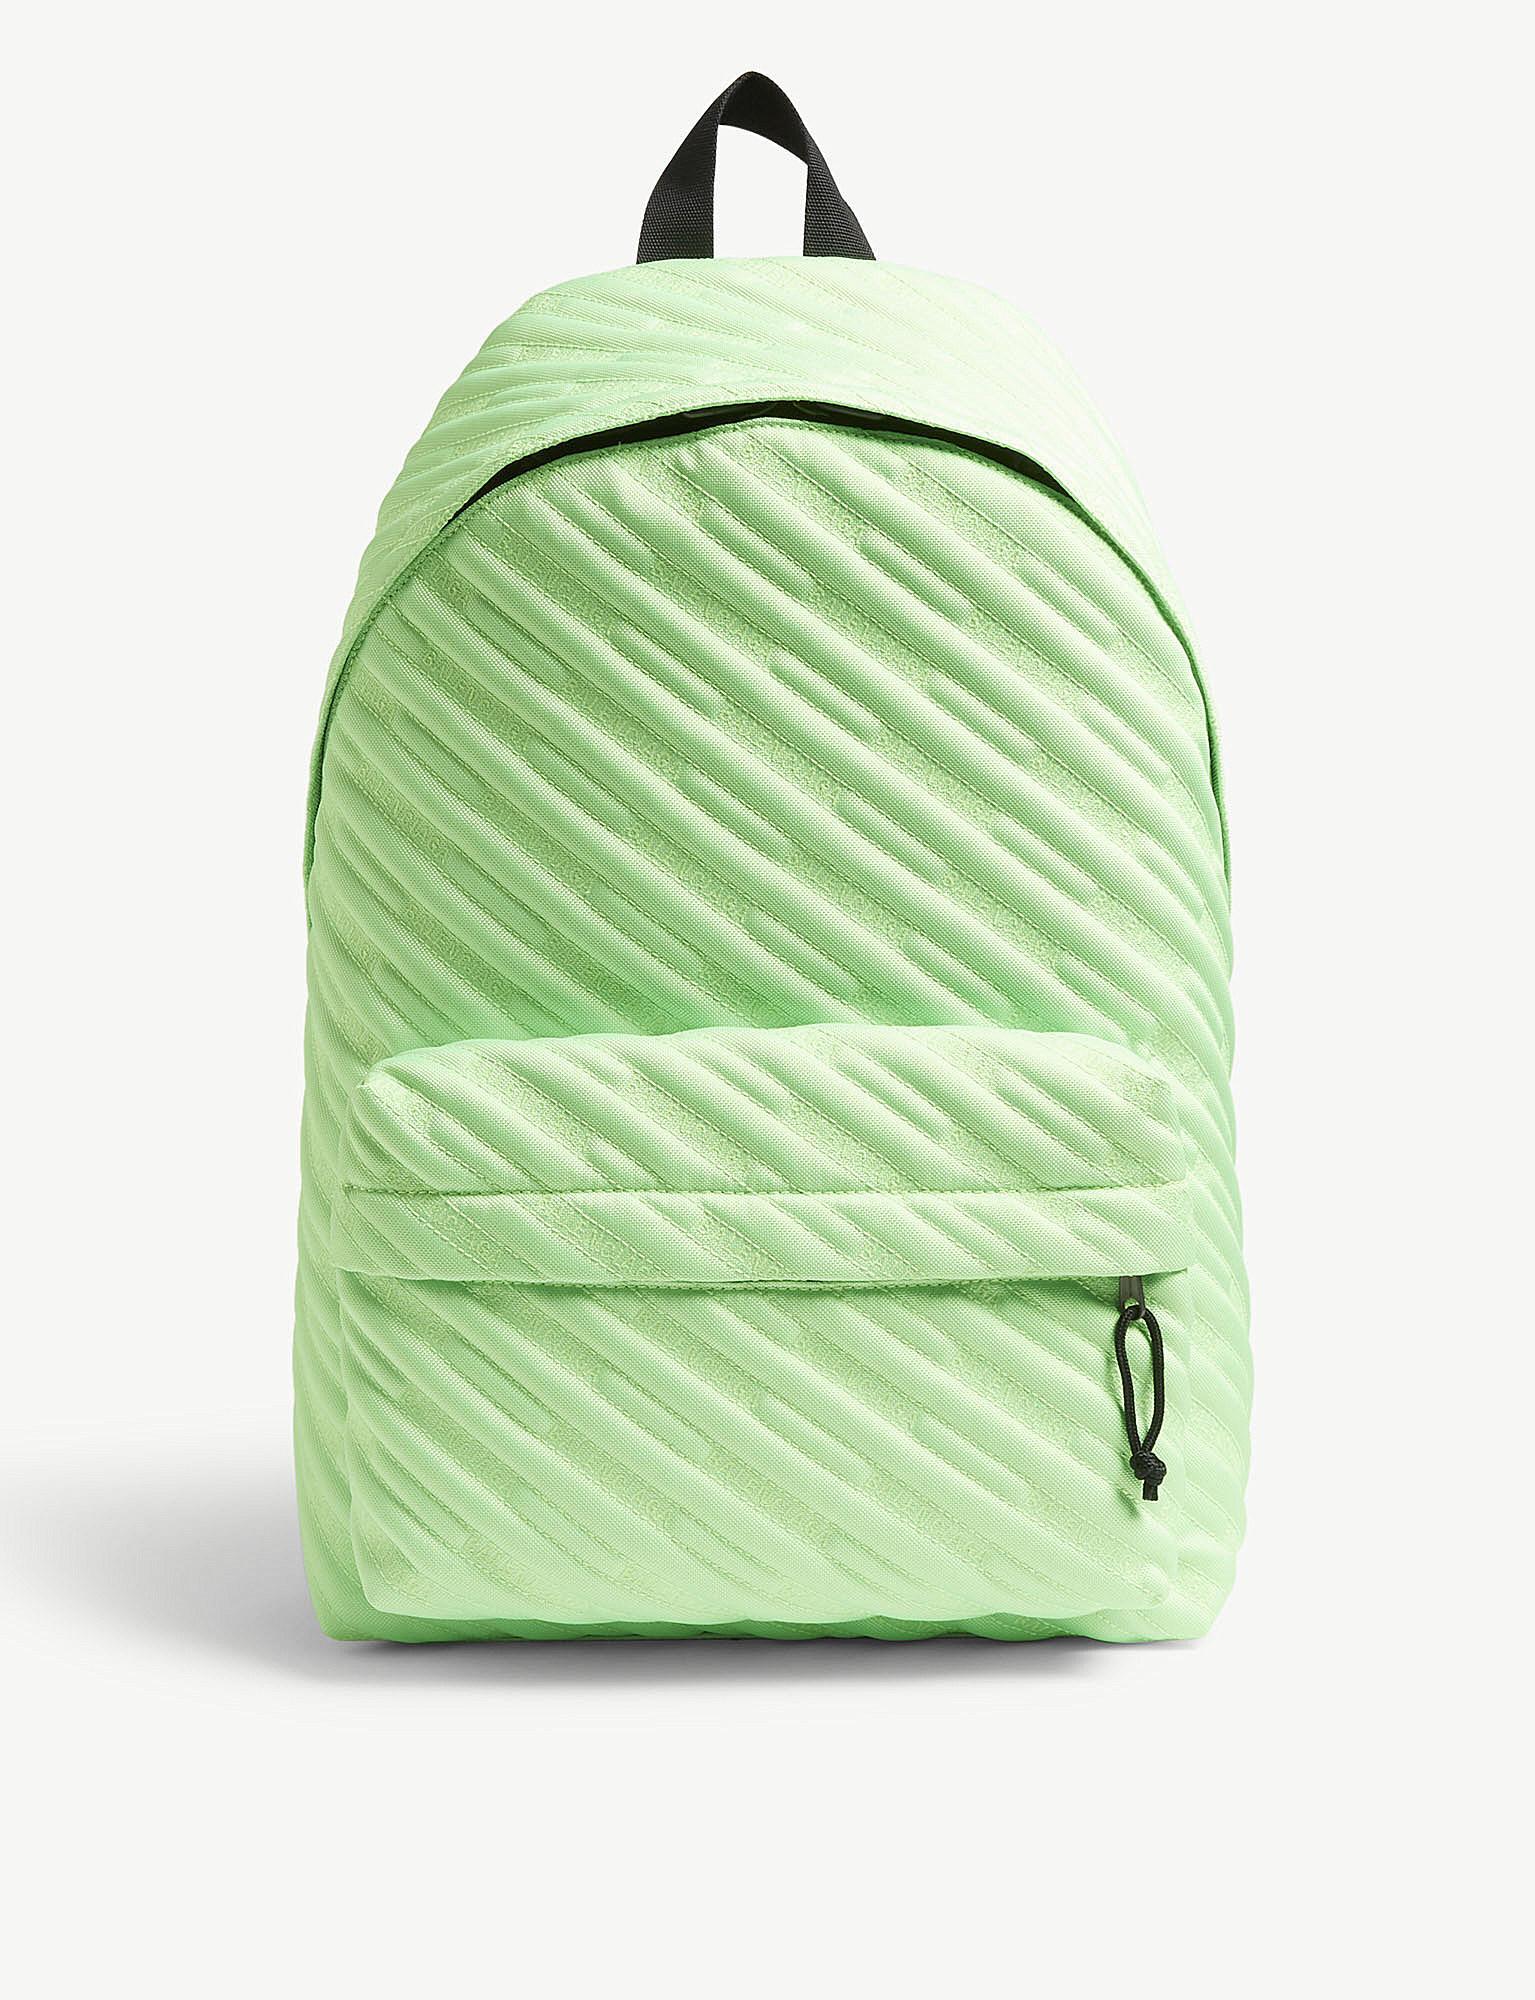 28cd36d1c803 Lyst - Balenciaga Explorer Logo Embroidered Nylon Backpack in Green ...